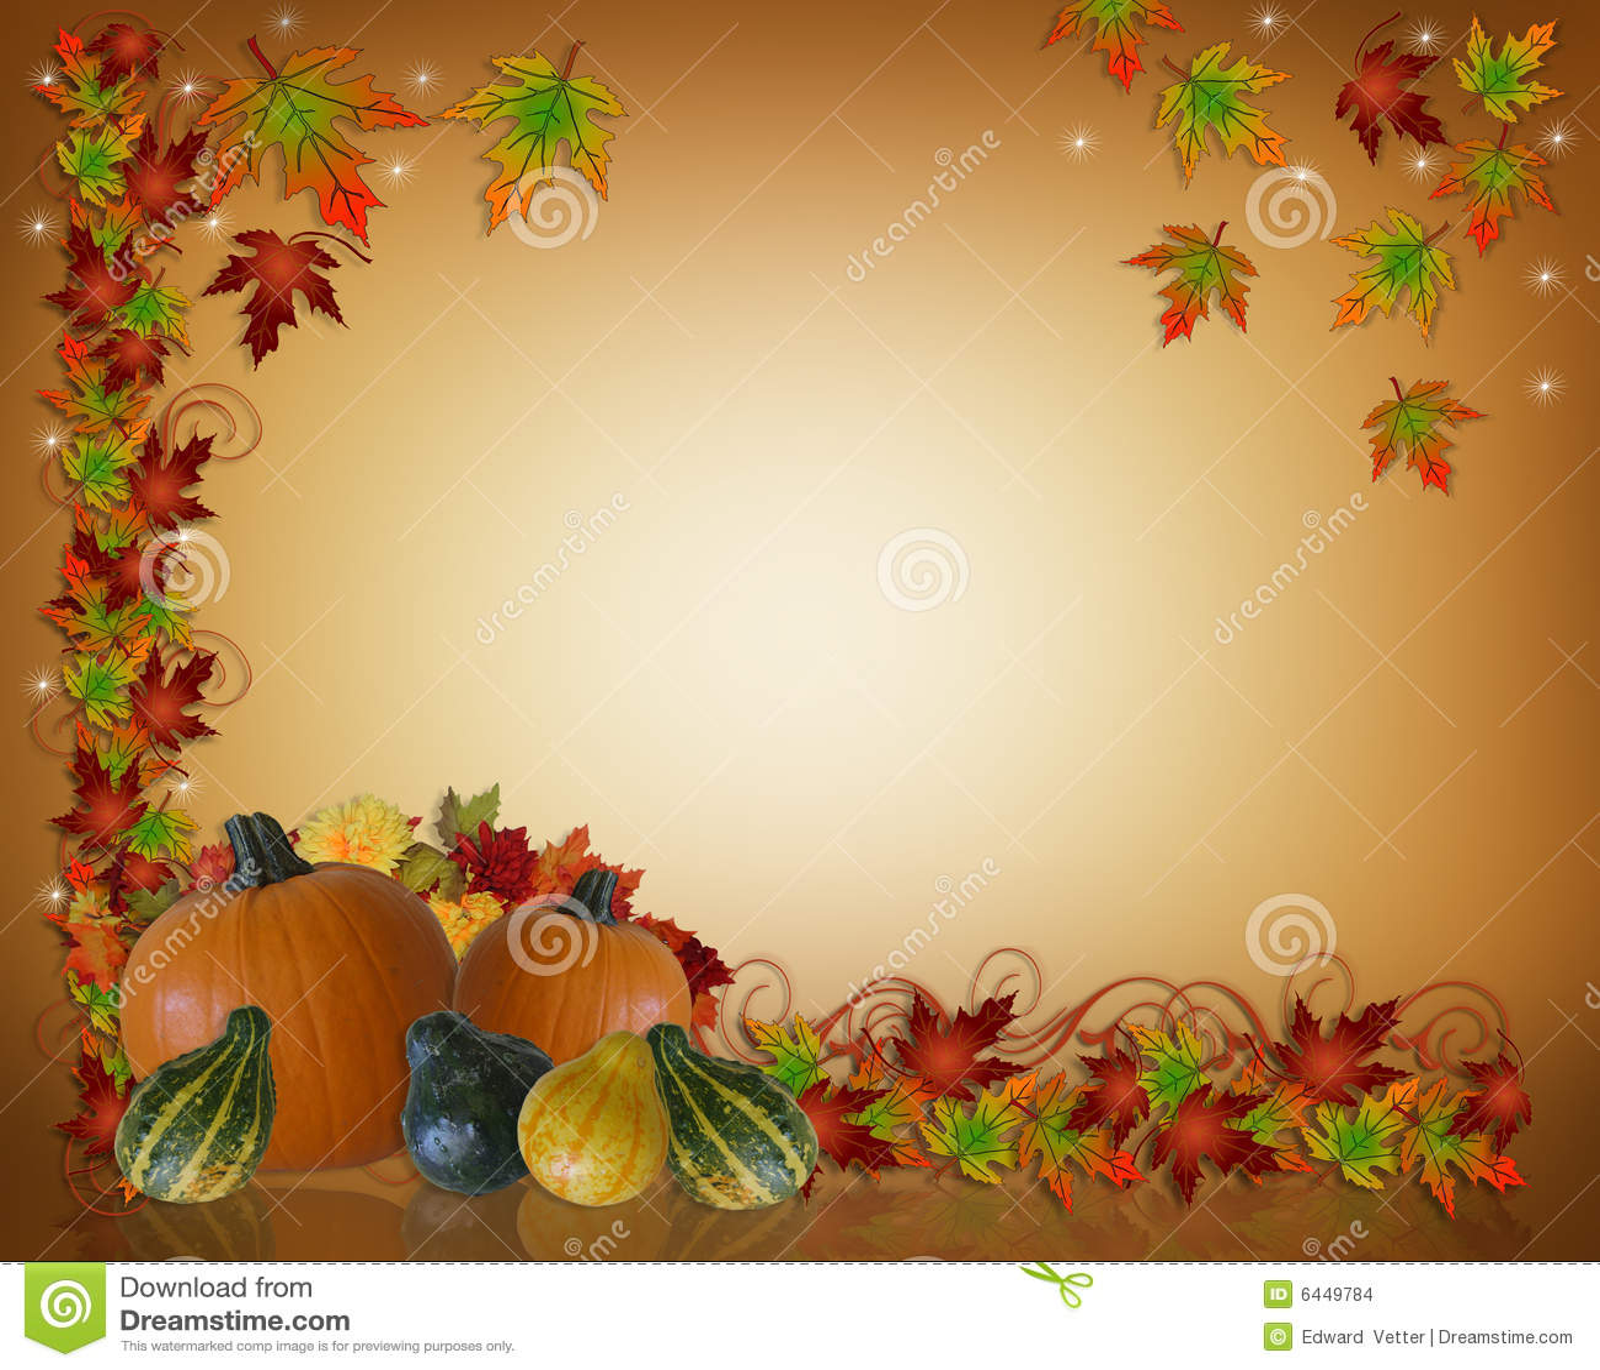 Illustration composition for Thanksgiving invitation, border or ...